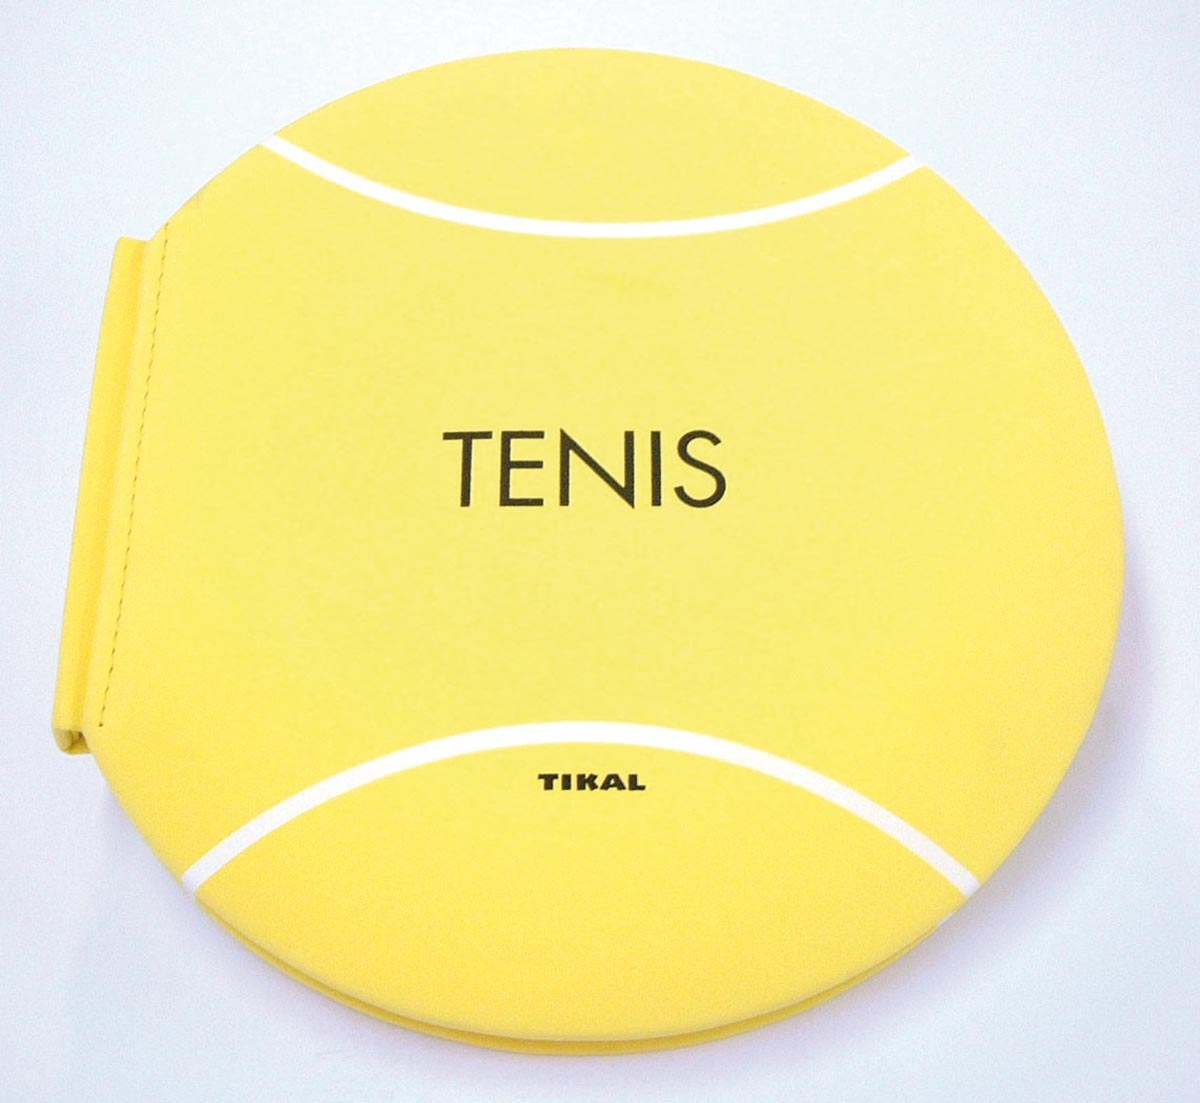 Tenis 9788499283739